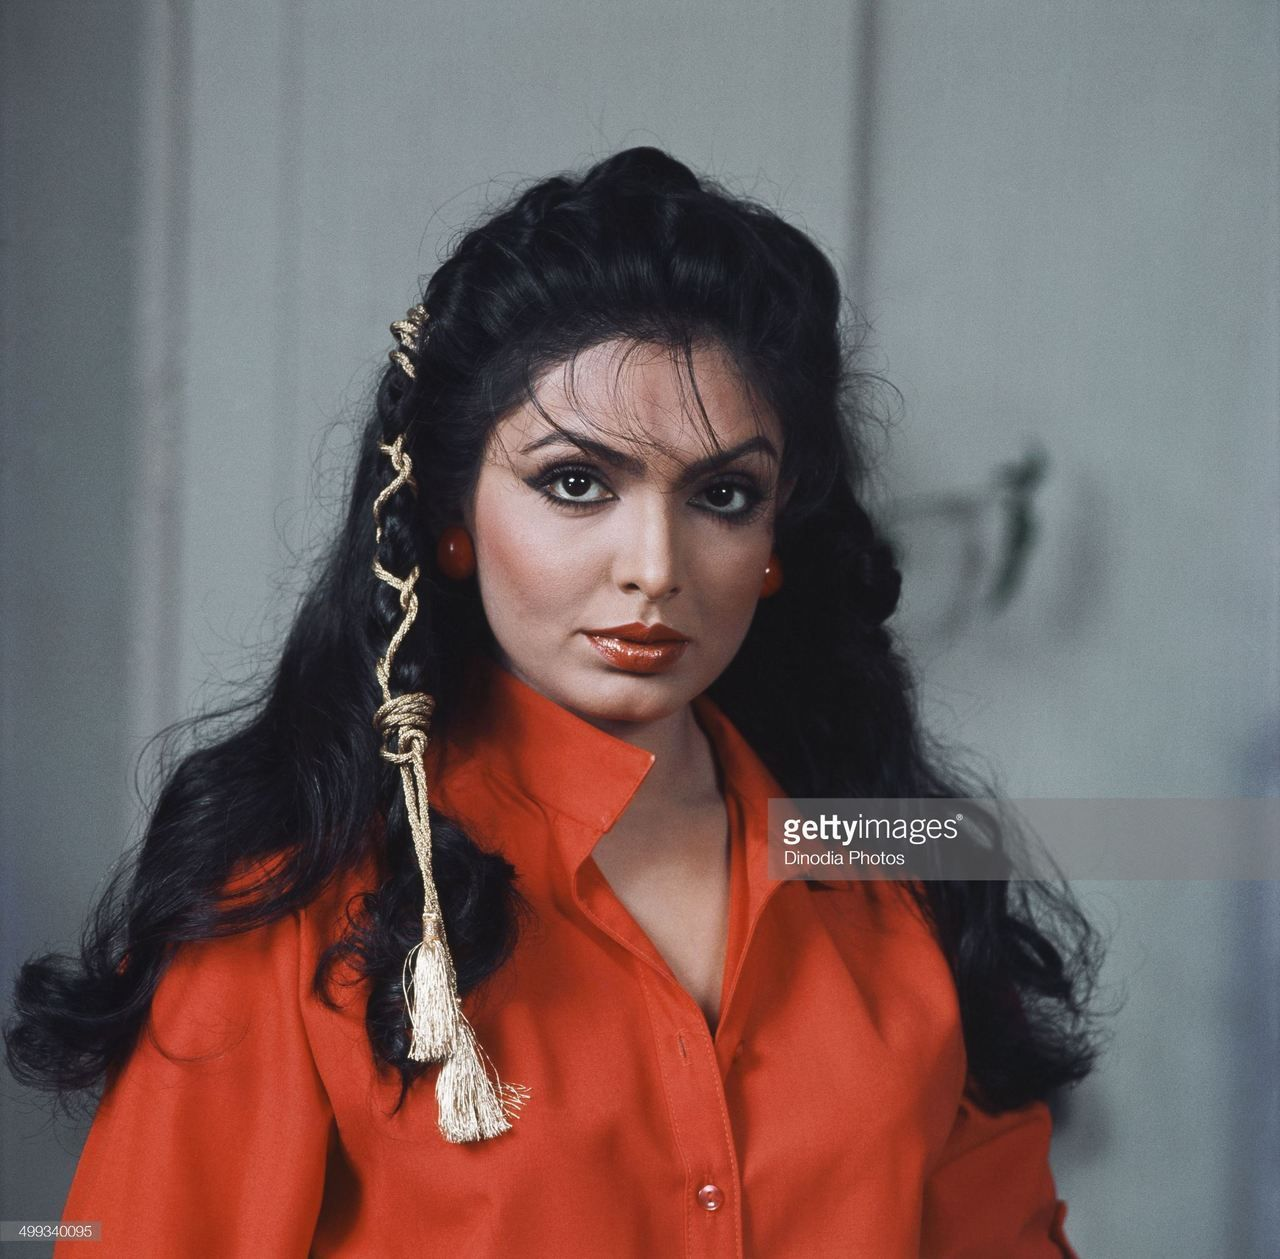 Memories Do Last Forever Parveen Babi Retro Hairstyles Retro Fashion 70s